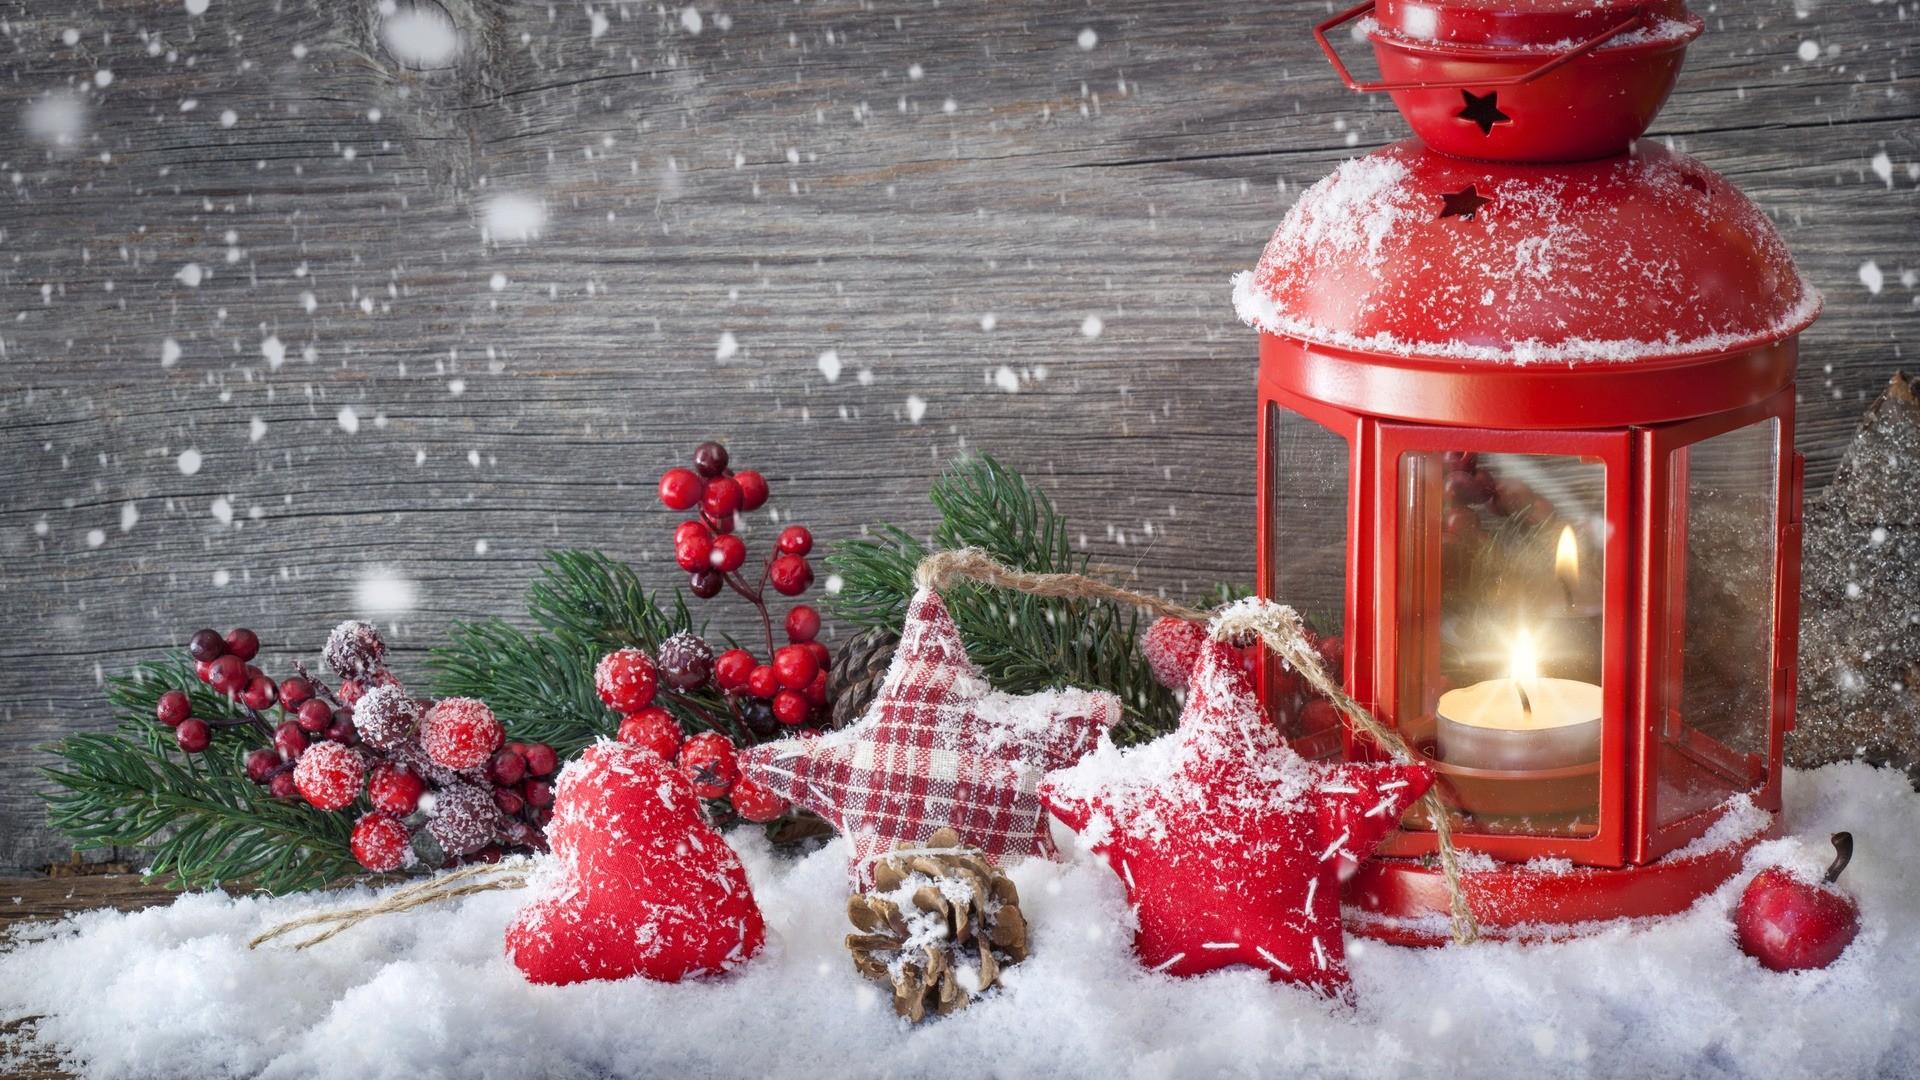 Christmas Desktop Wallpapers 62 Pictures